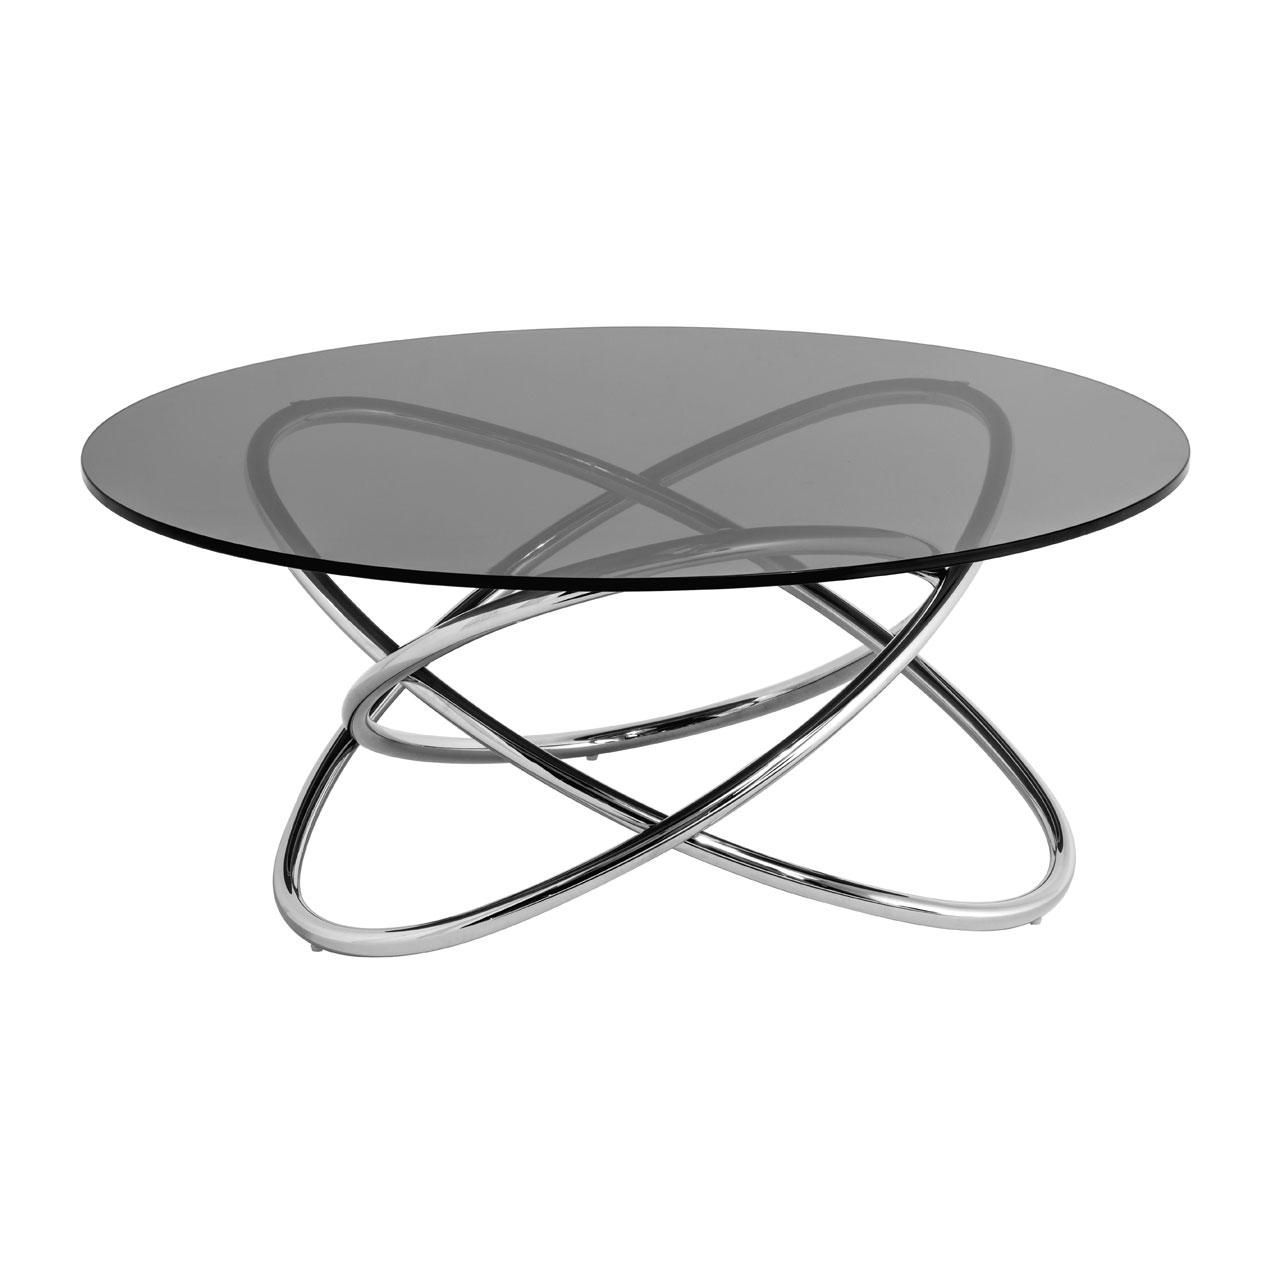 Orb Smoke Glass Coffee Table Dark Tempered Glass Fads